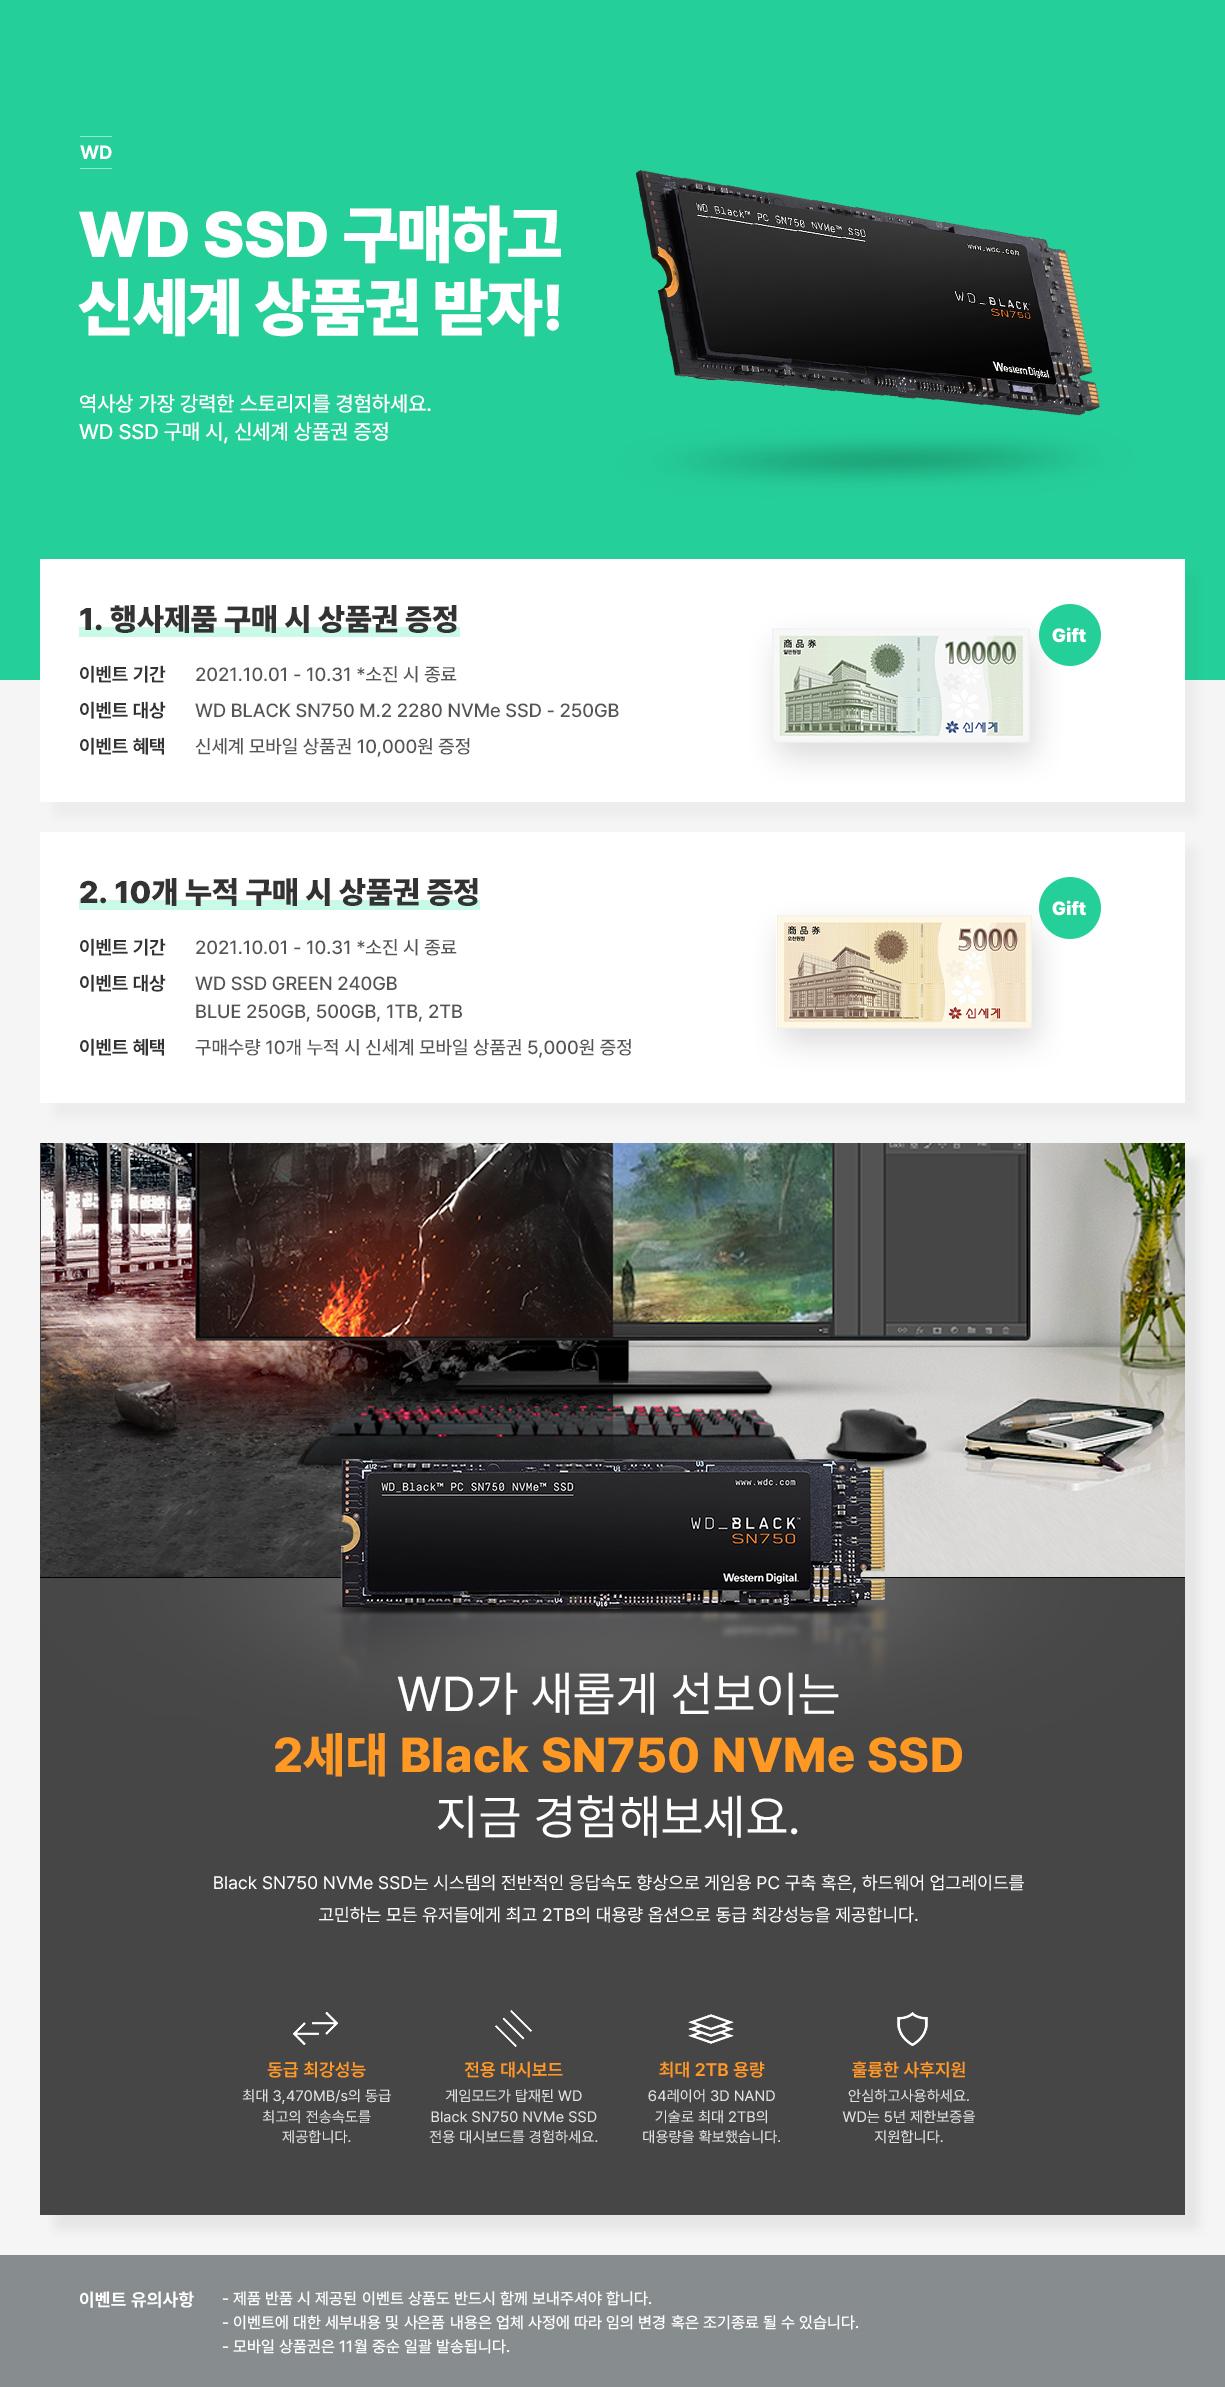 59206_WD_SSD_사은.jpg